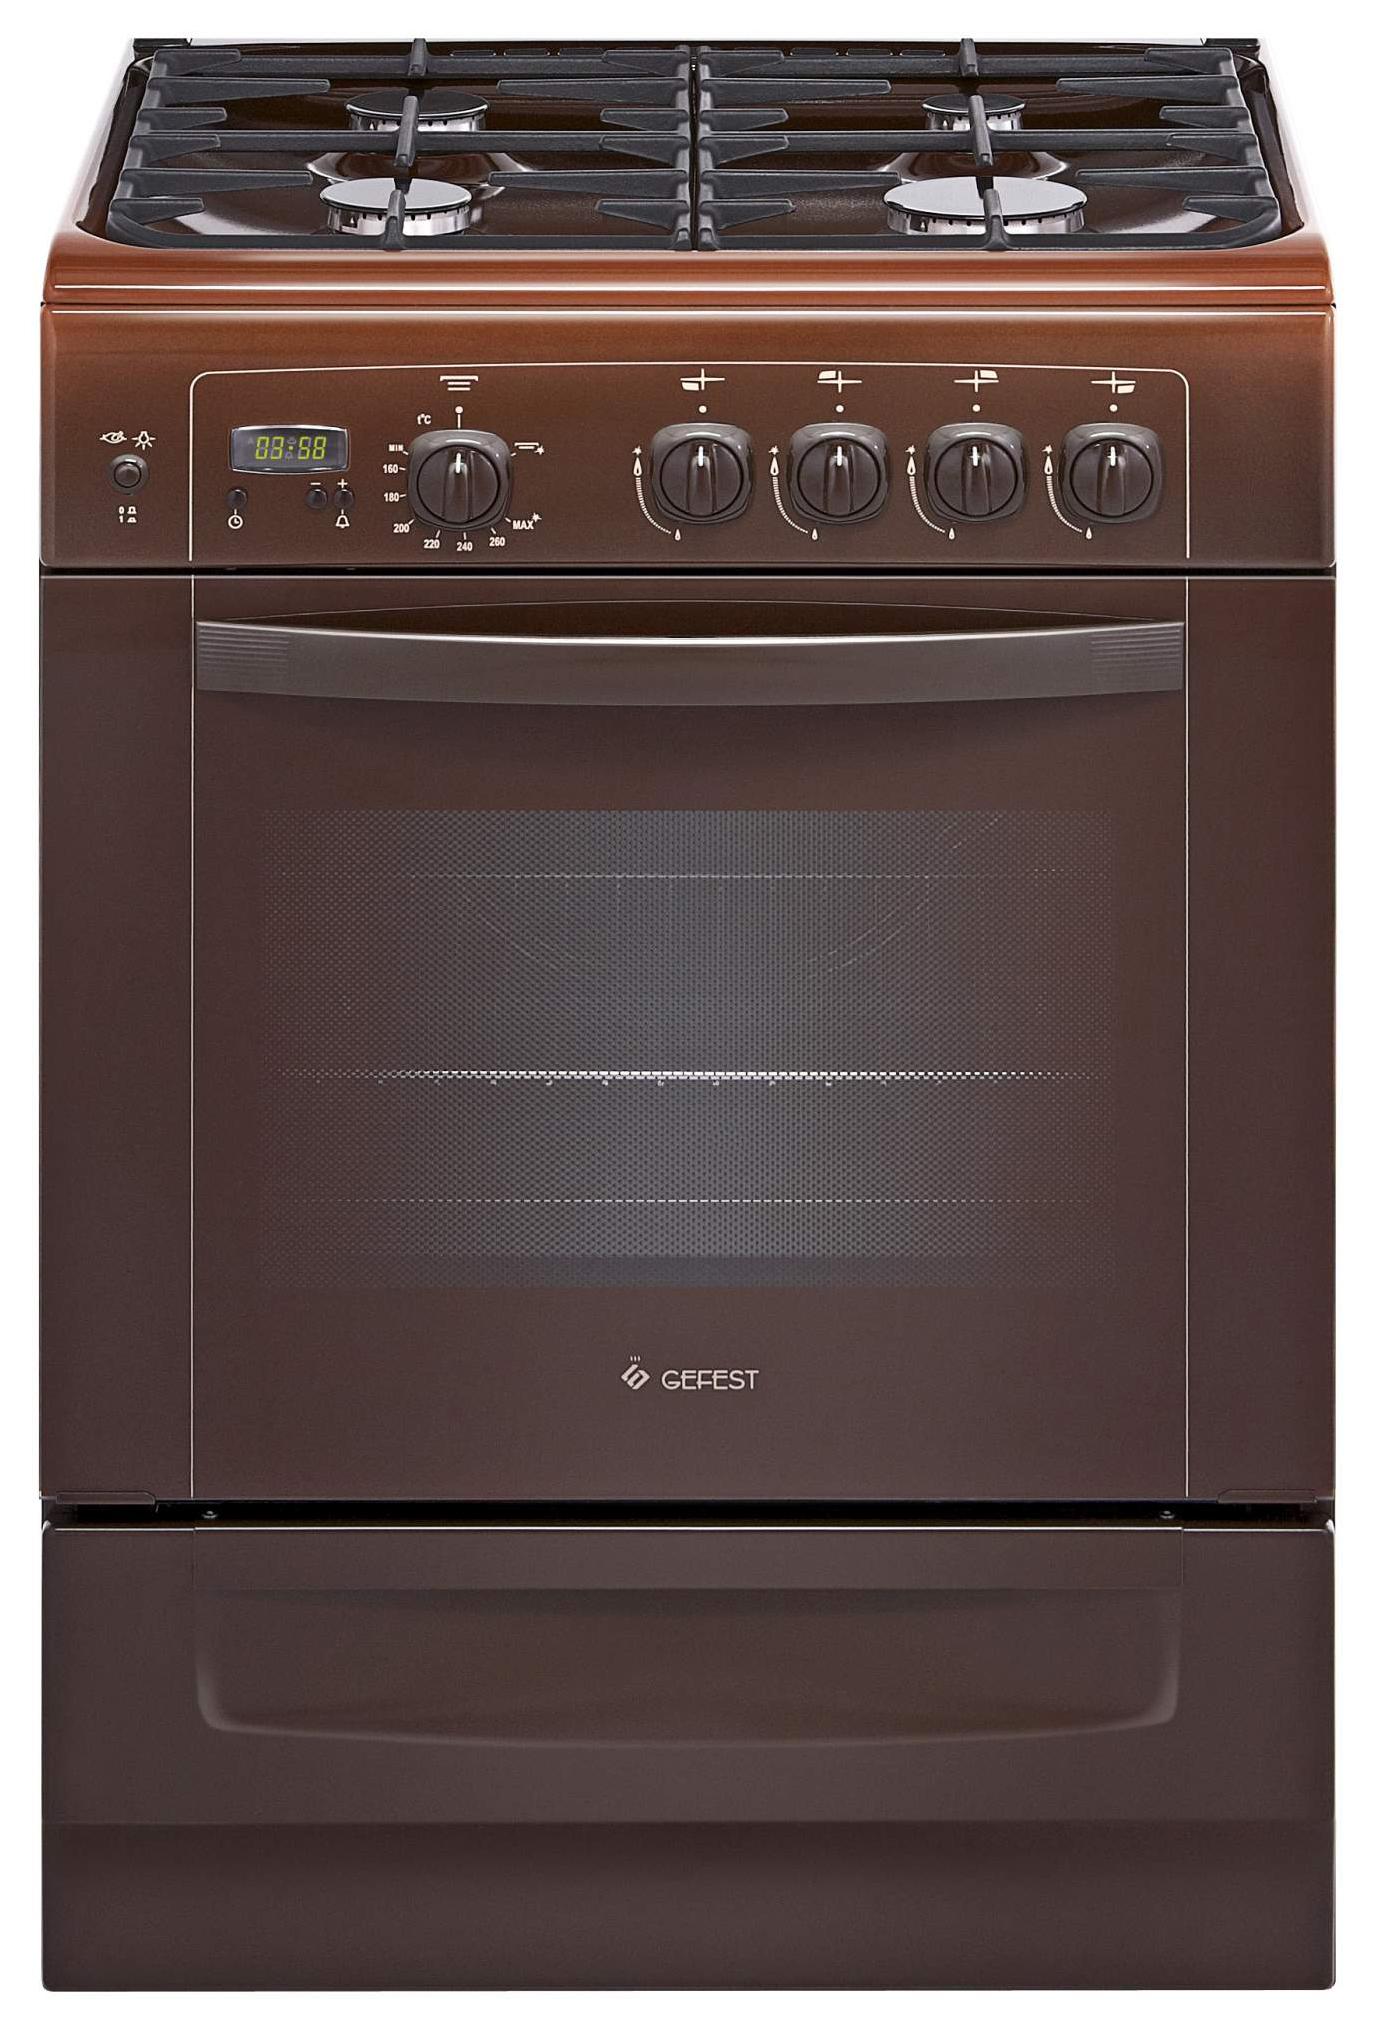 Газовая плита GEFEST ПГ 6100-03 0003 Brown